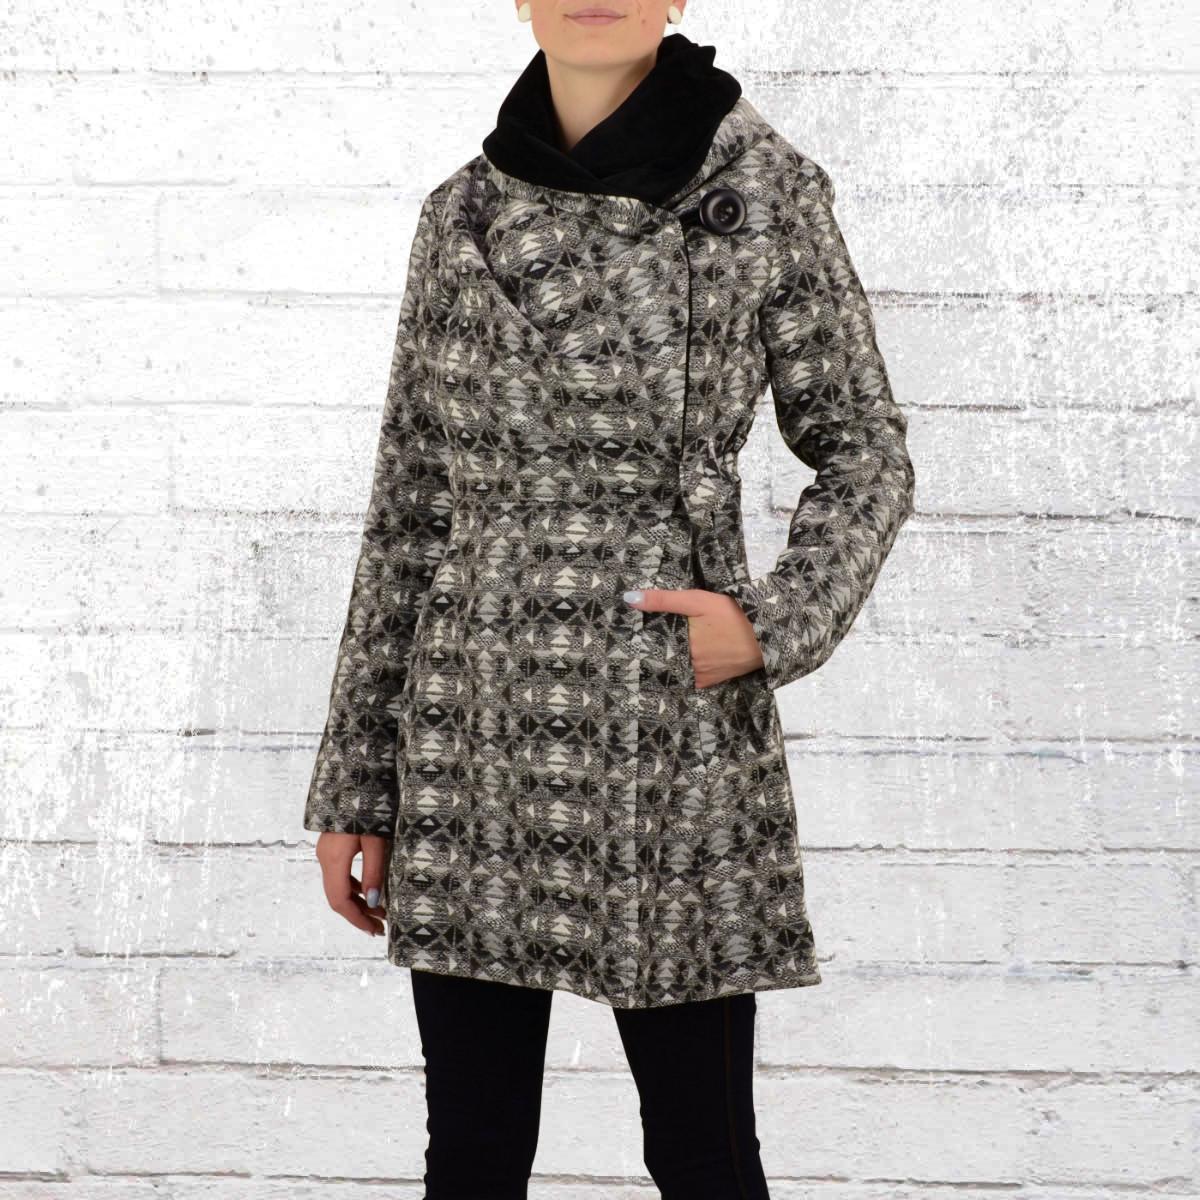 jetzt bestellen ato berlin damen kurz mantel bea schwarz grau weiss krasse. Black Bedroom Furniture Sets. Home Design Ideas